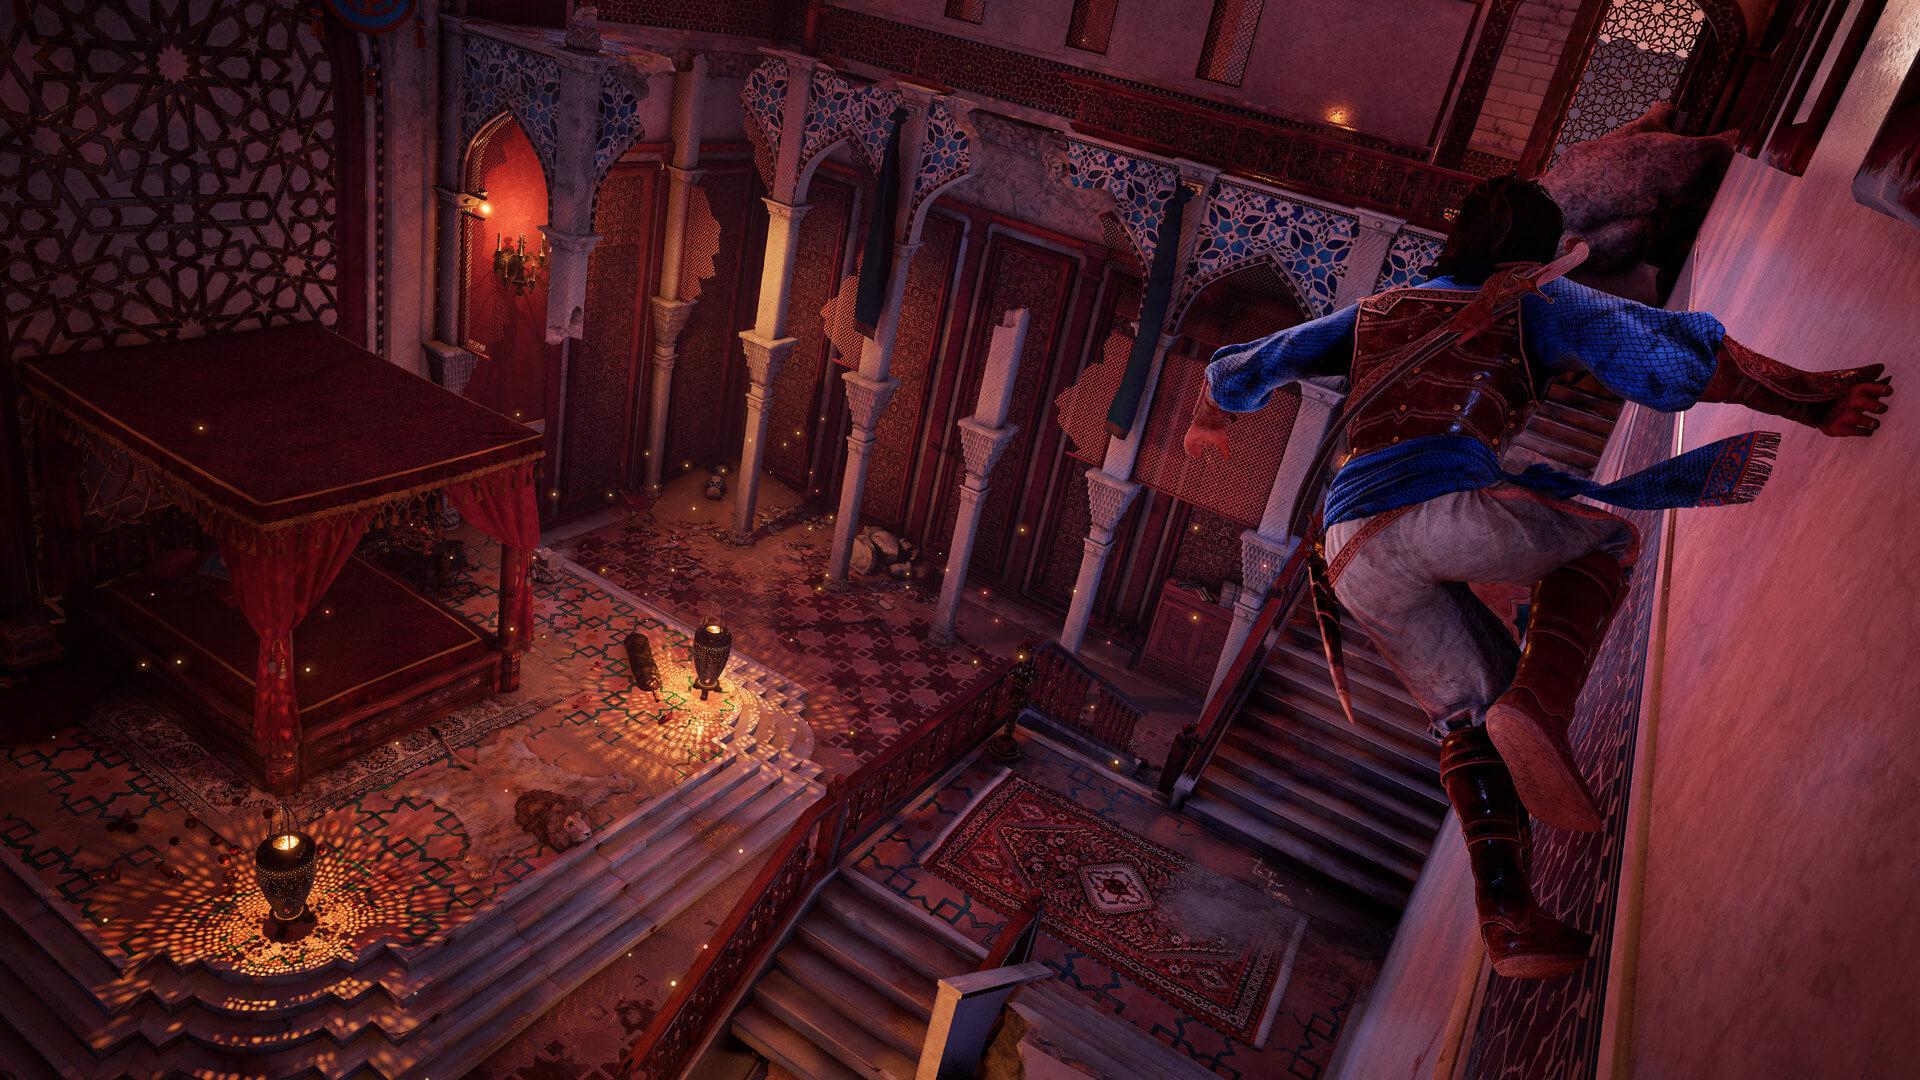 تریلر ریمیک بازی Prince of Persia: The Sands of Time